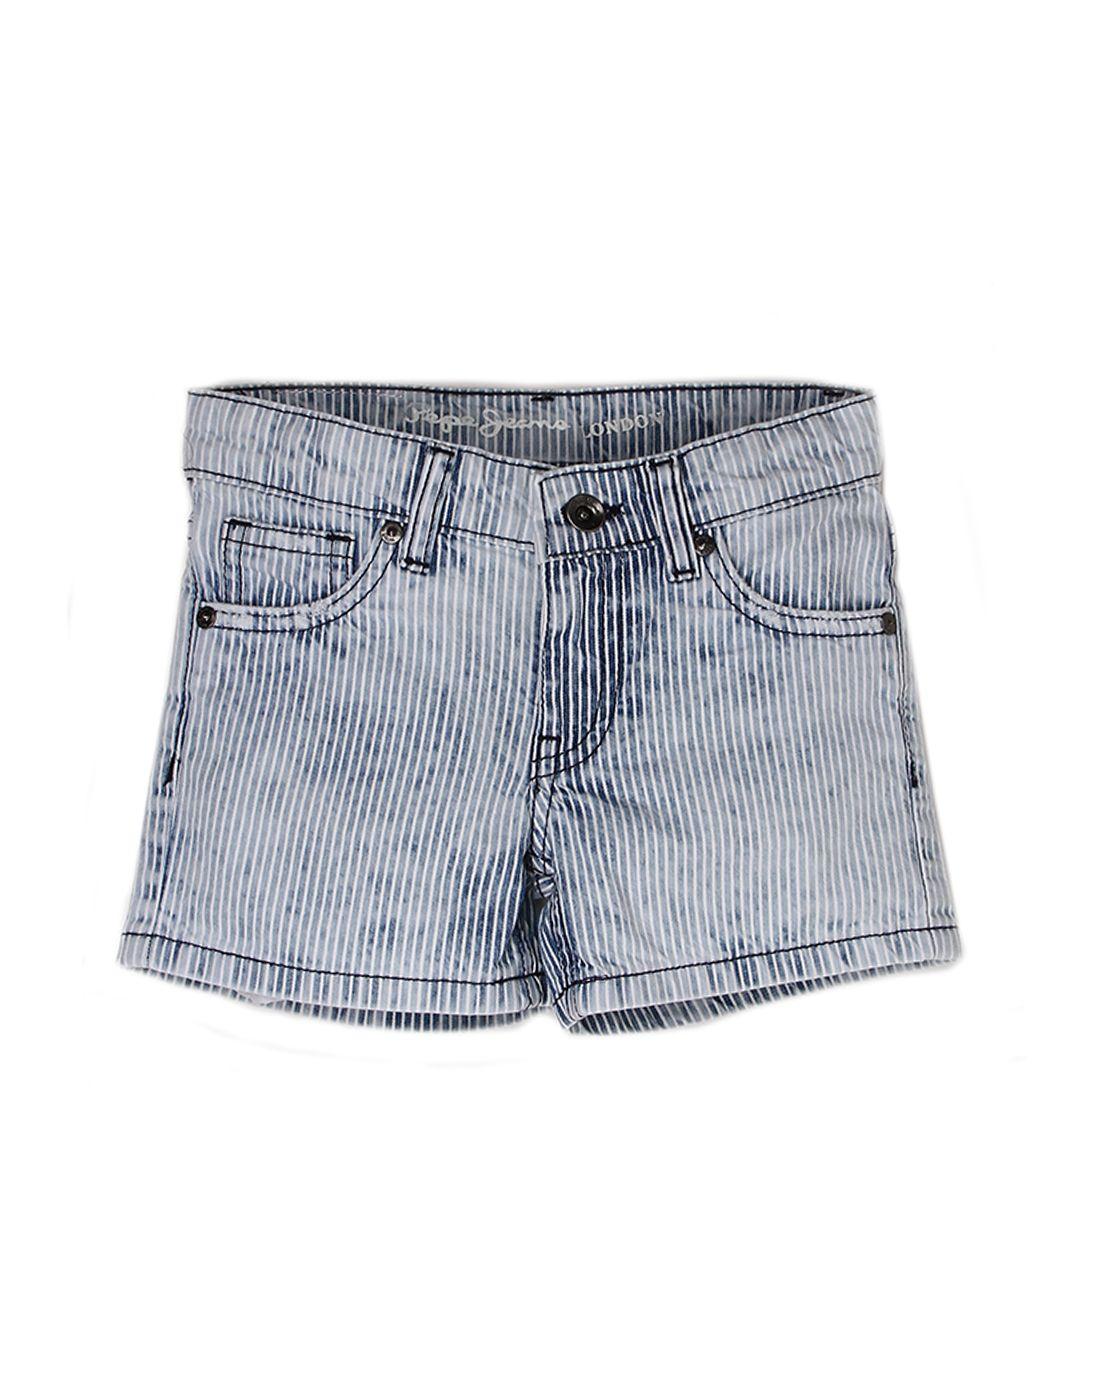 Pepe Jeans Girls Cotton  Regular Casual Grey Short